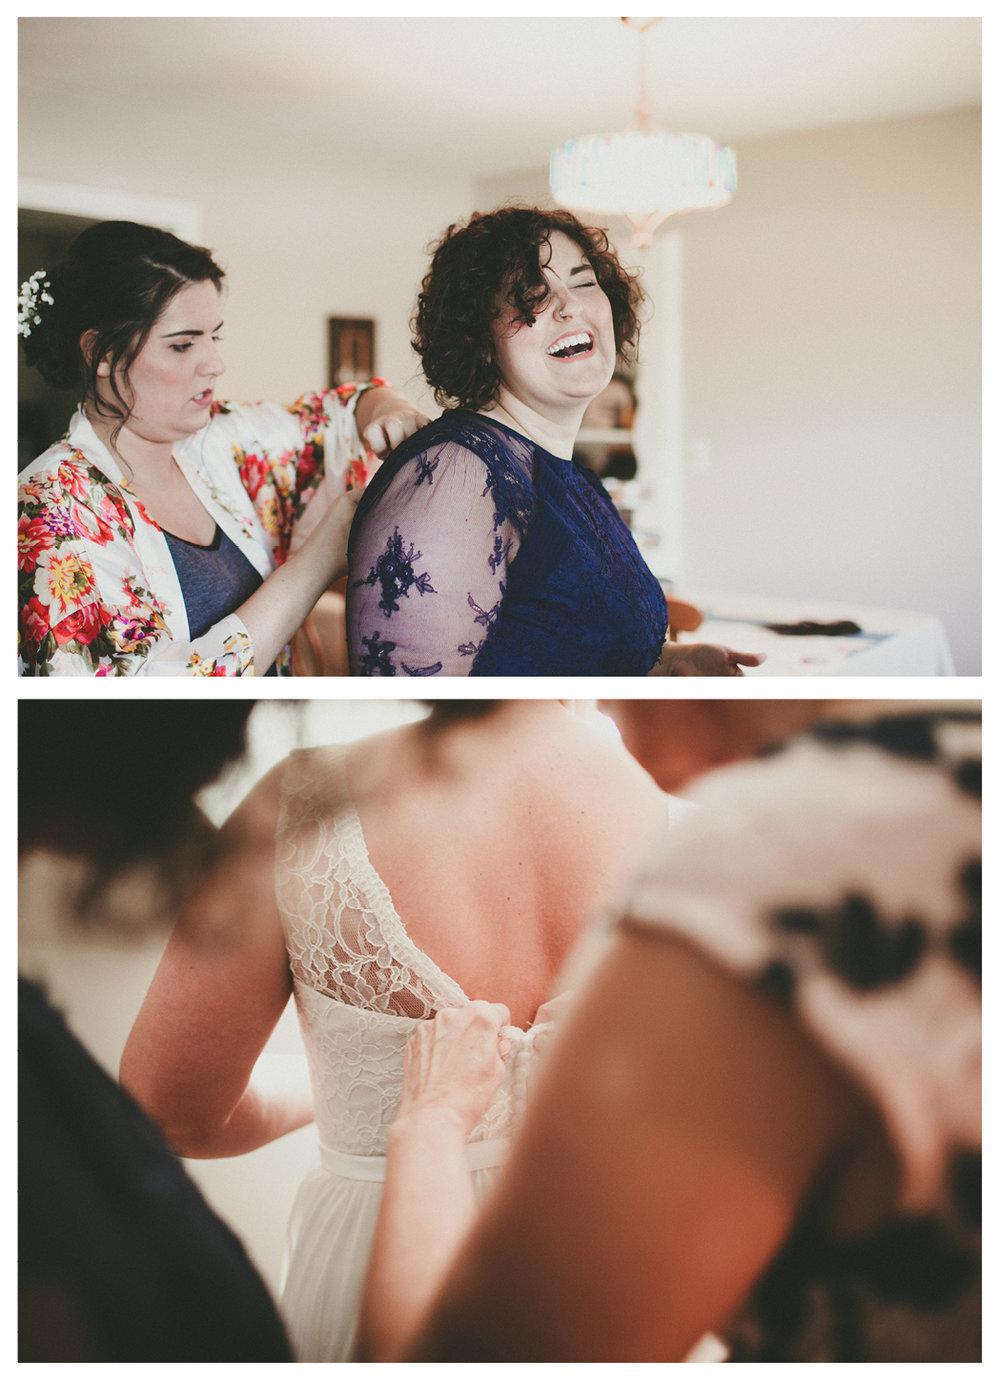 Ashley_Vance_Wedding153.jpg